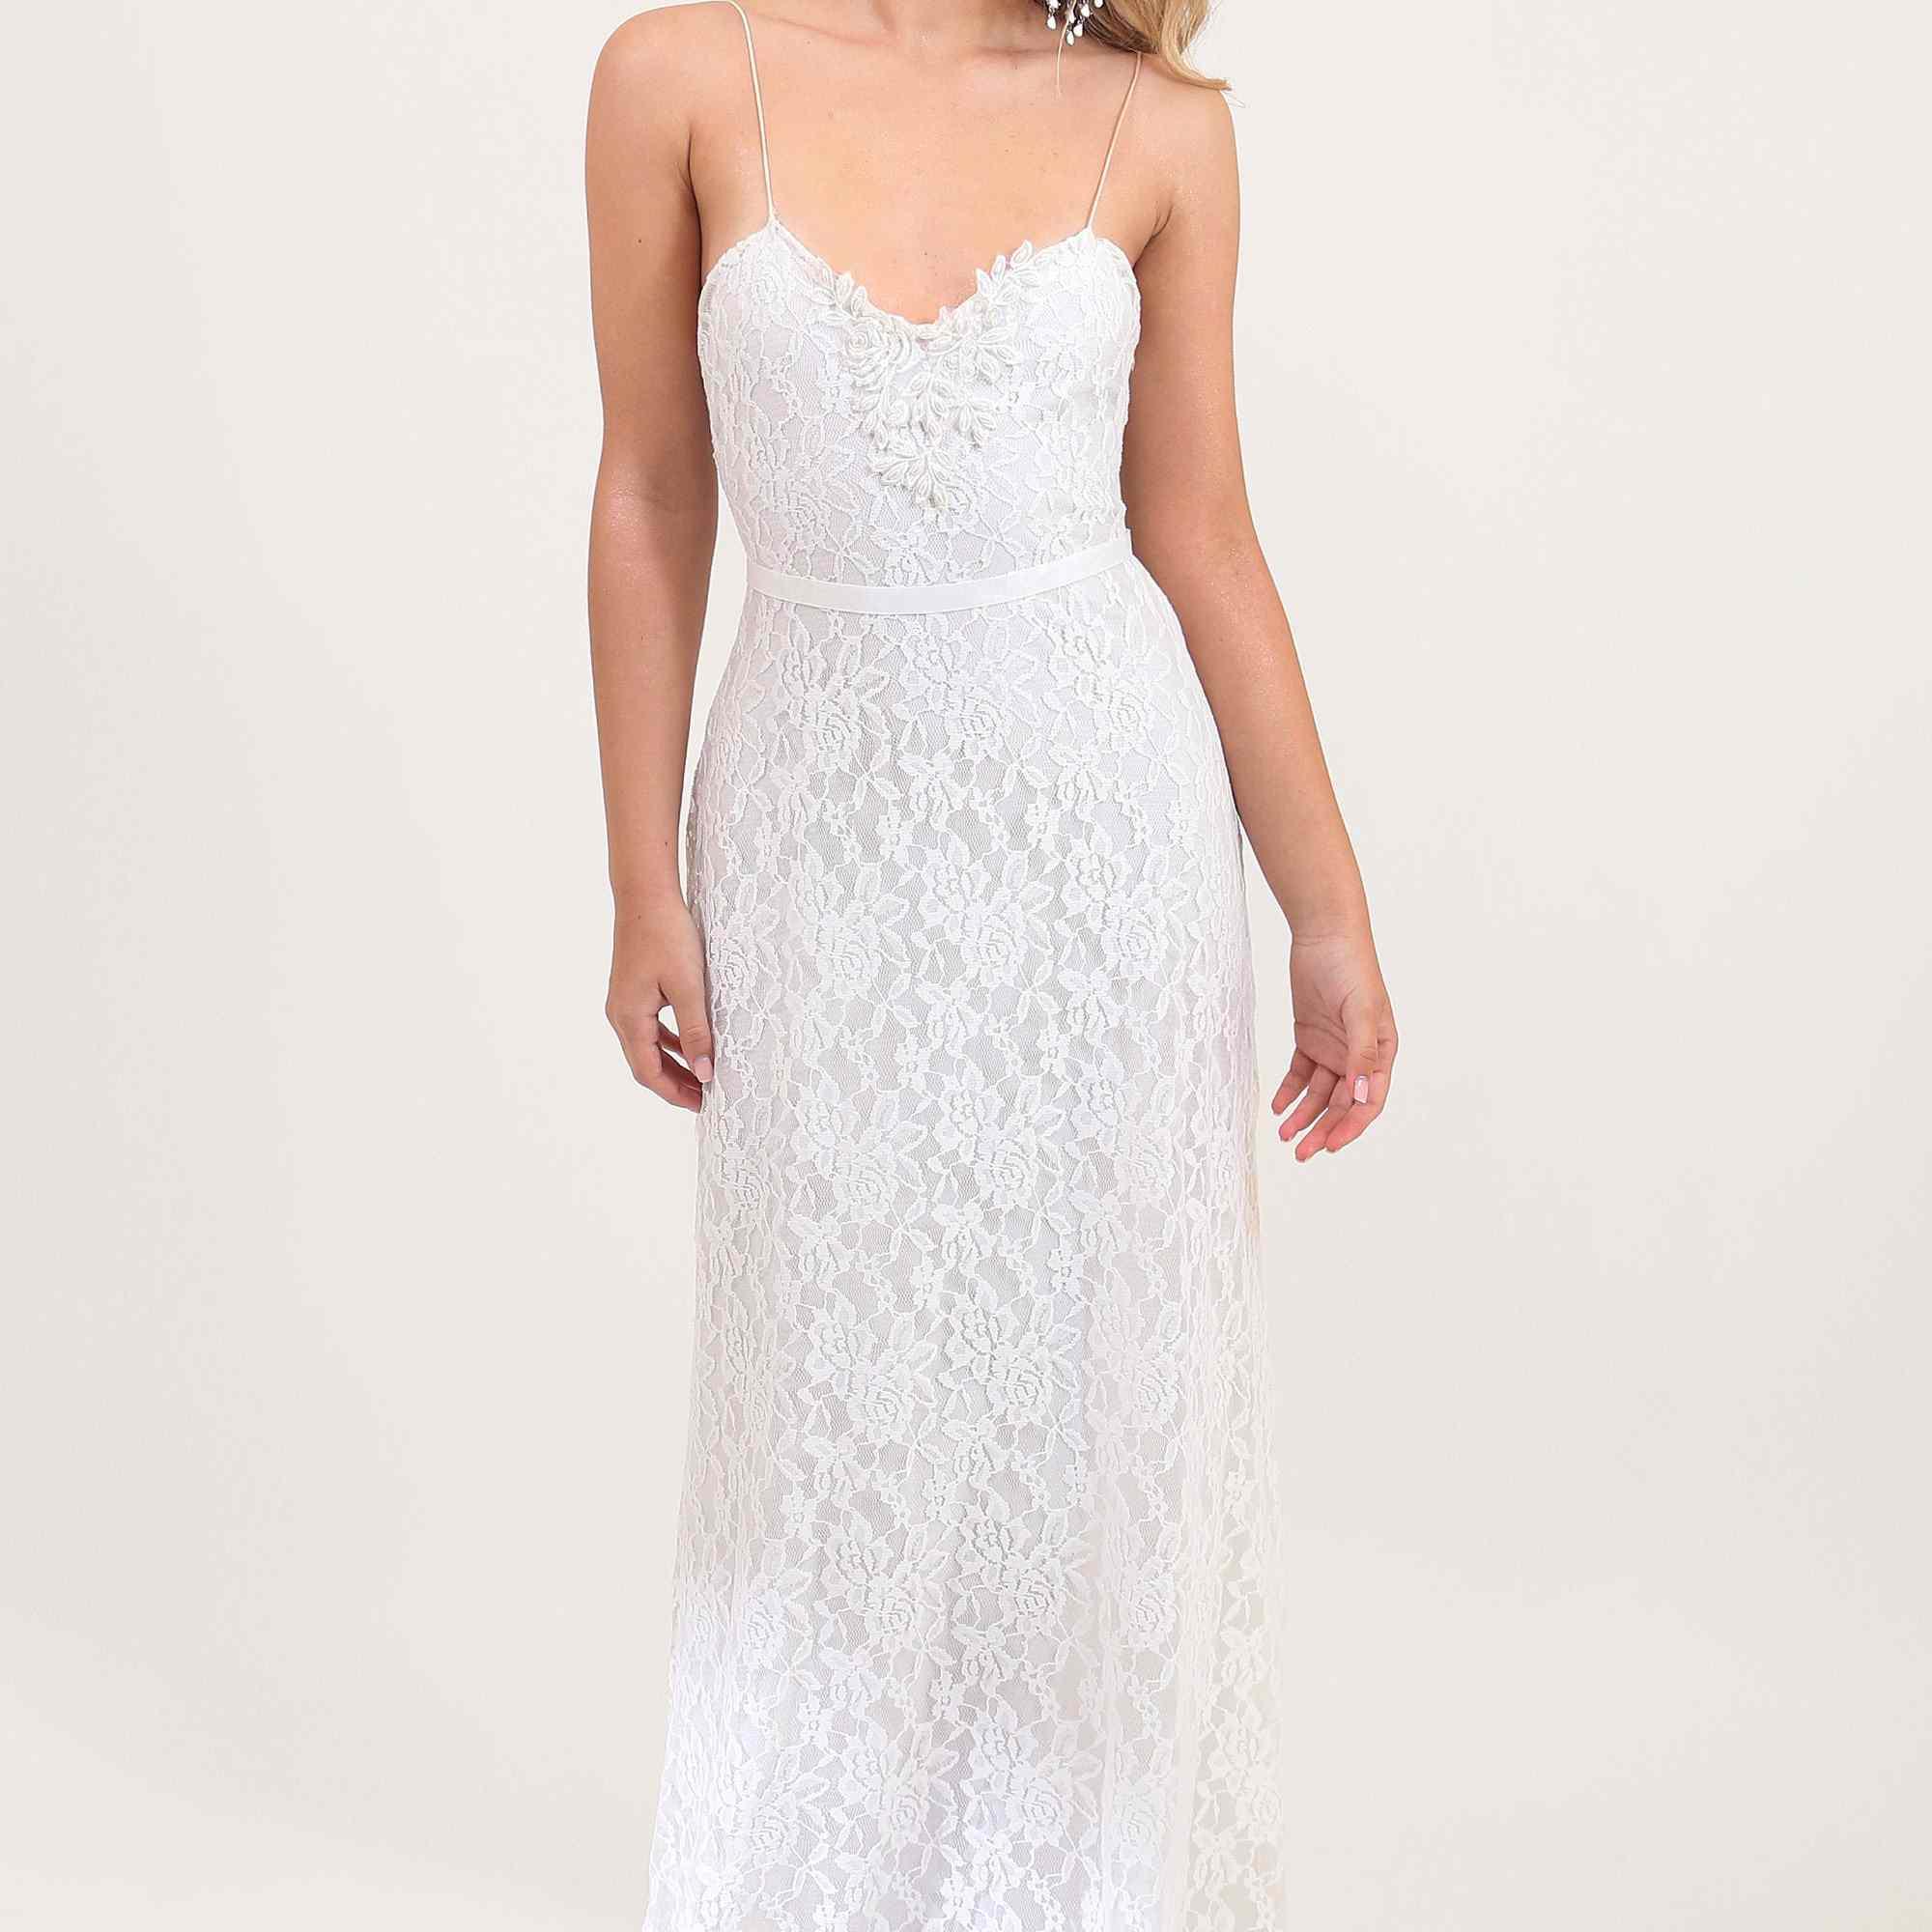 Etsy Wedding Dress.13 Wedding Dresses We Love From Etsy